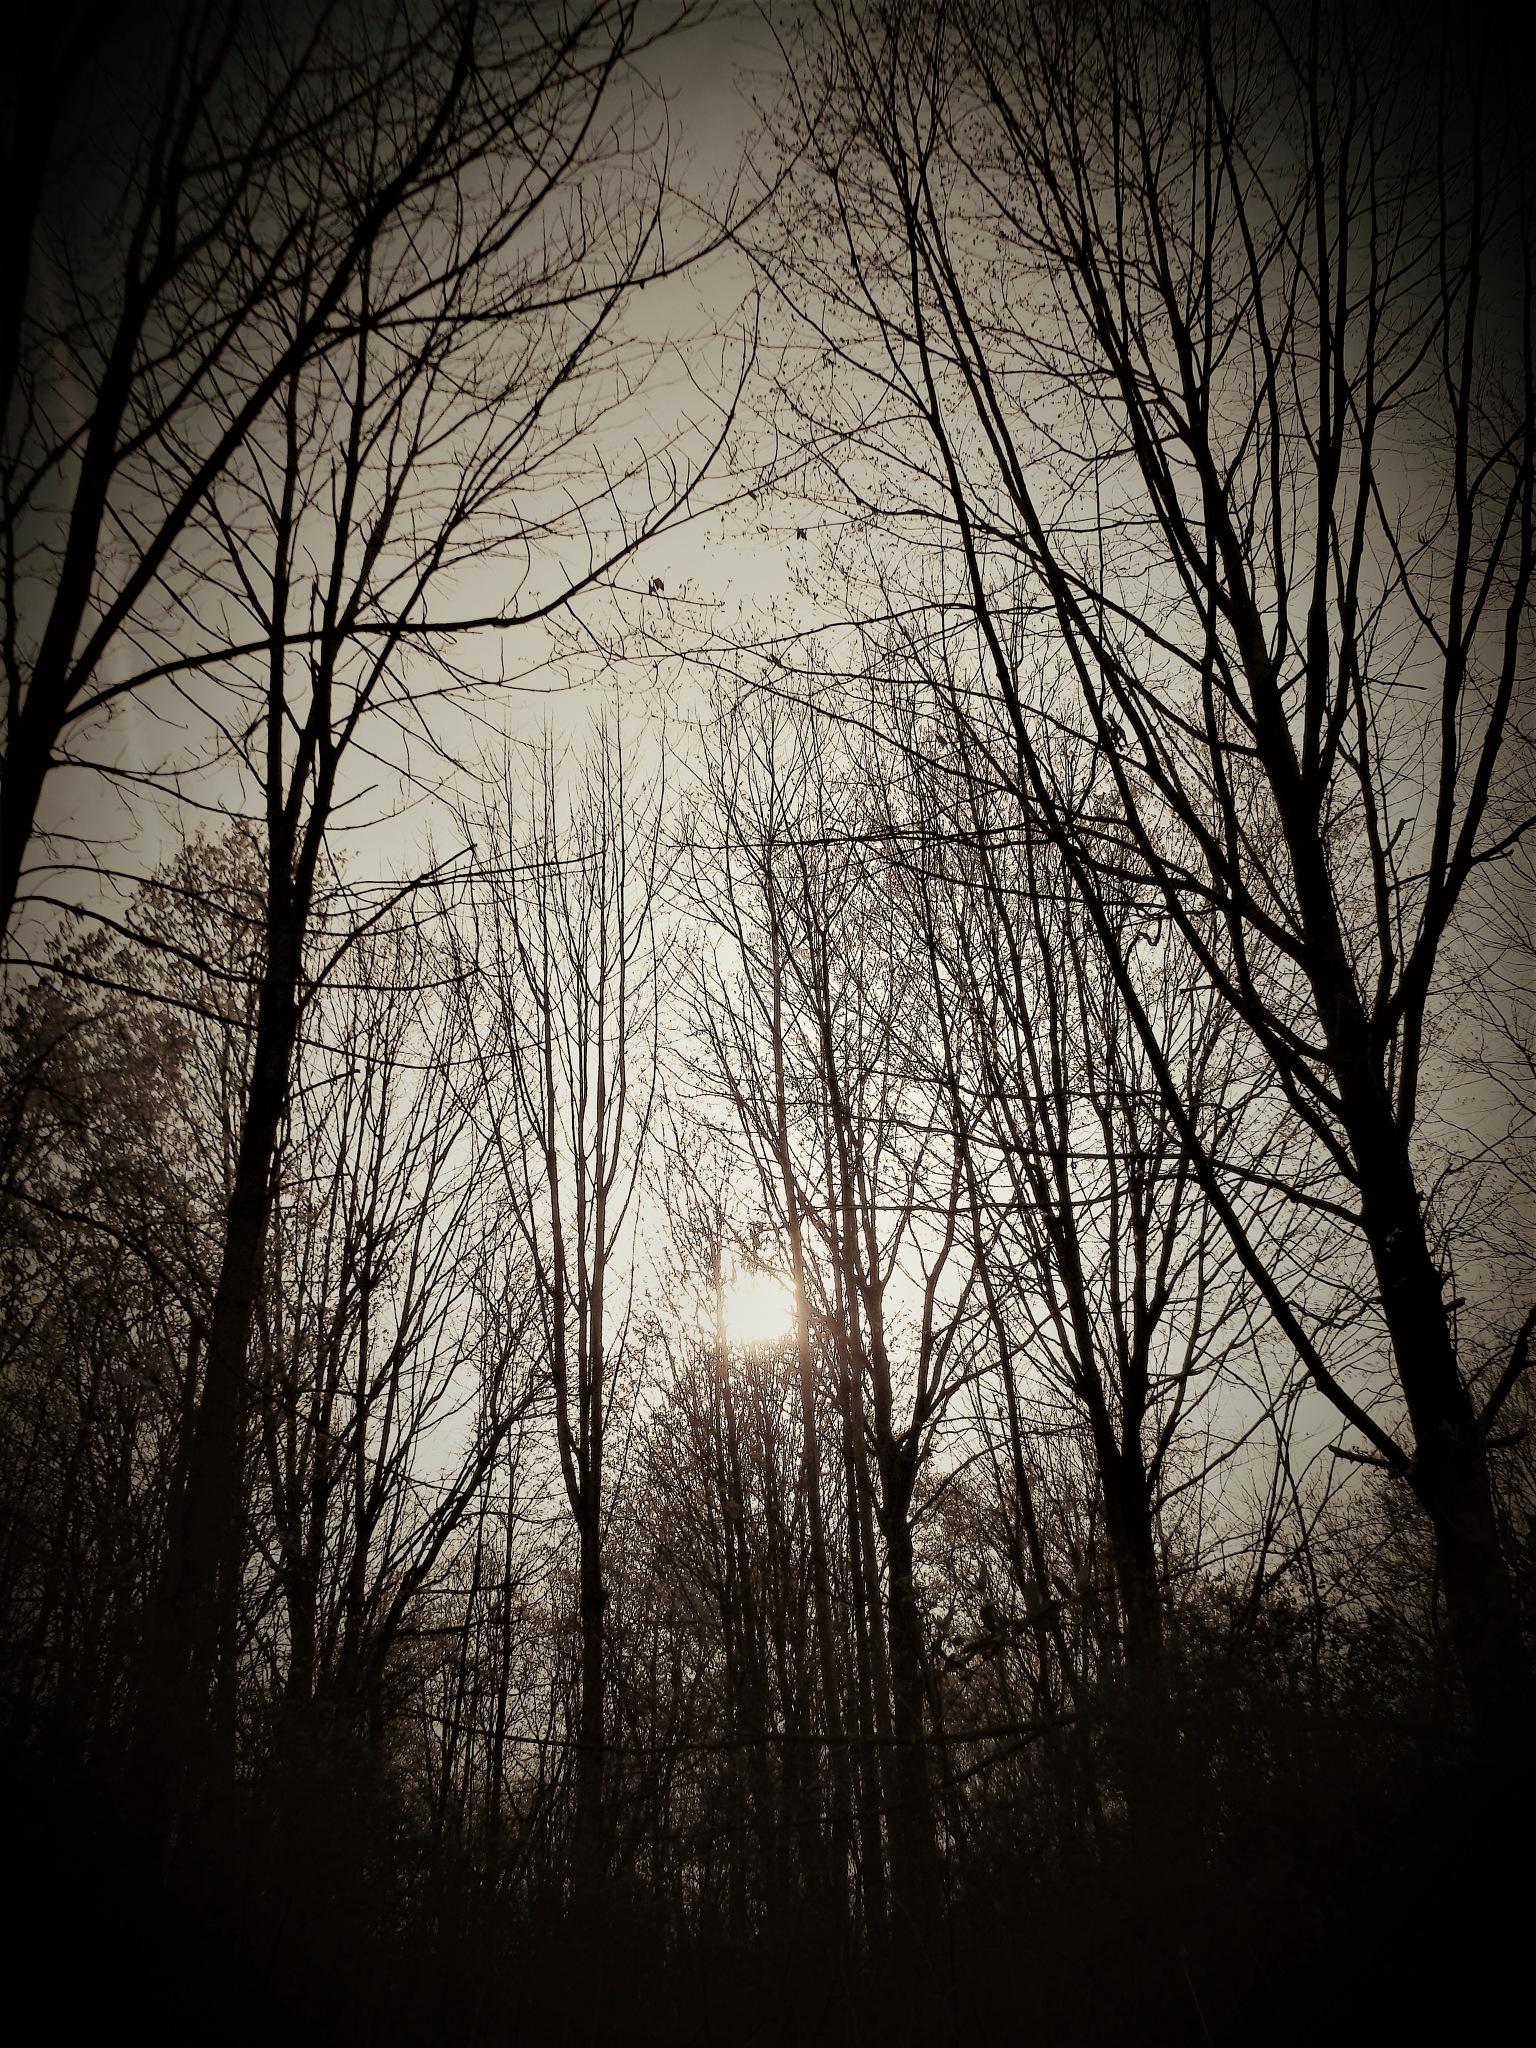 LOOKING UP by Dawn Hoffmeister